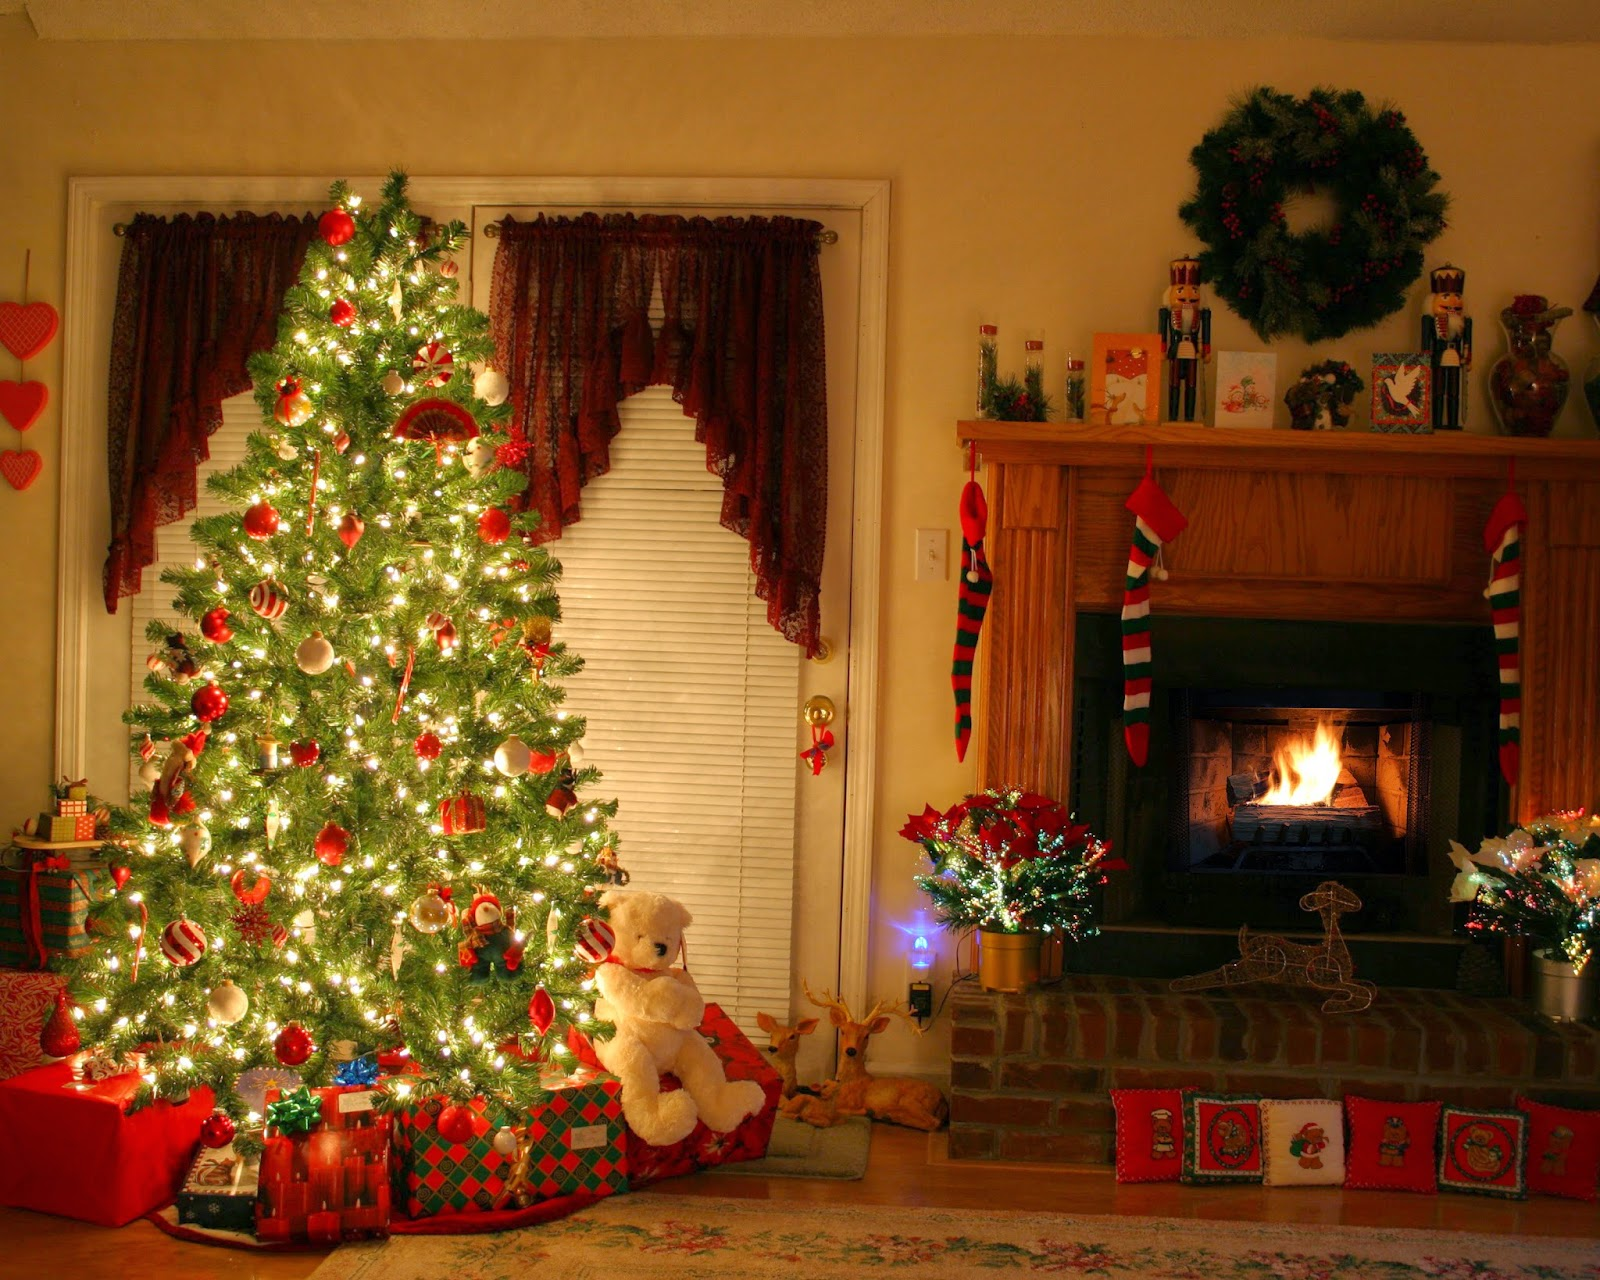 Christmas fireplace mantel decoration ideas for home made  ~ 135305_Christmas Decorating Ideas Traditional Home